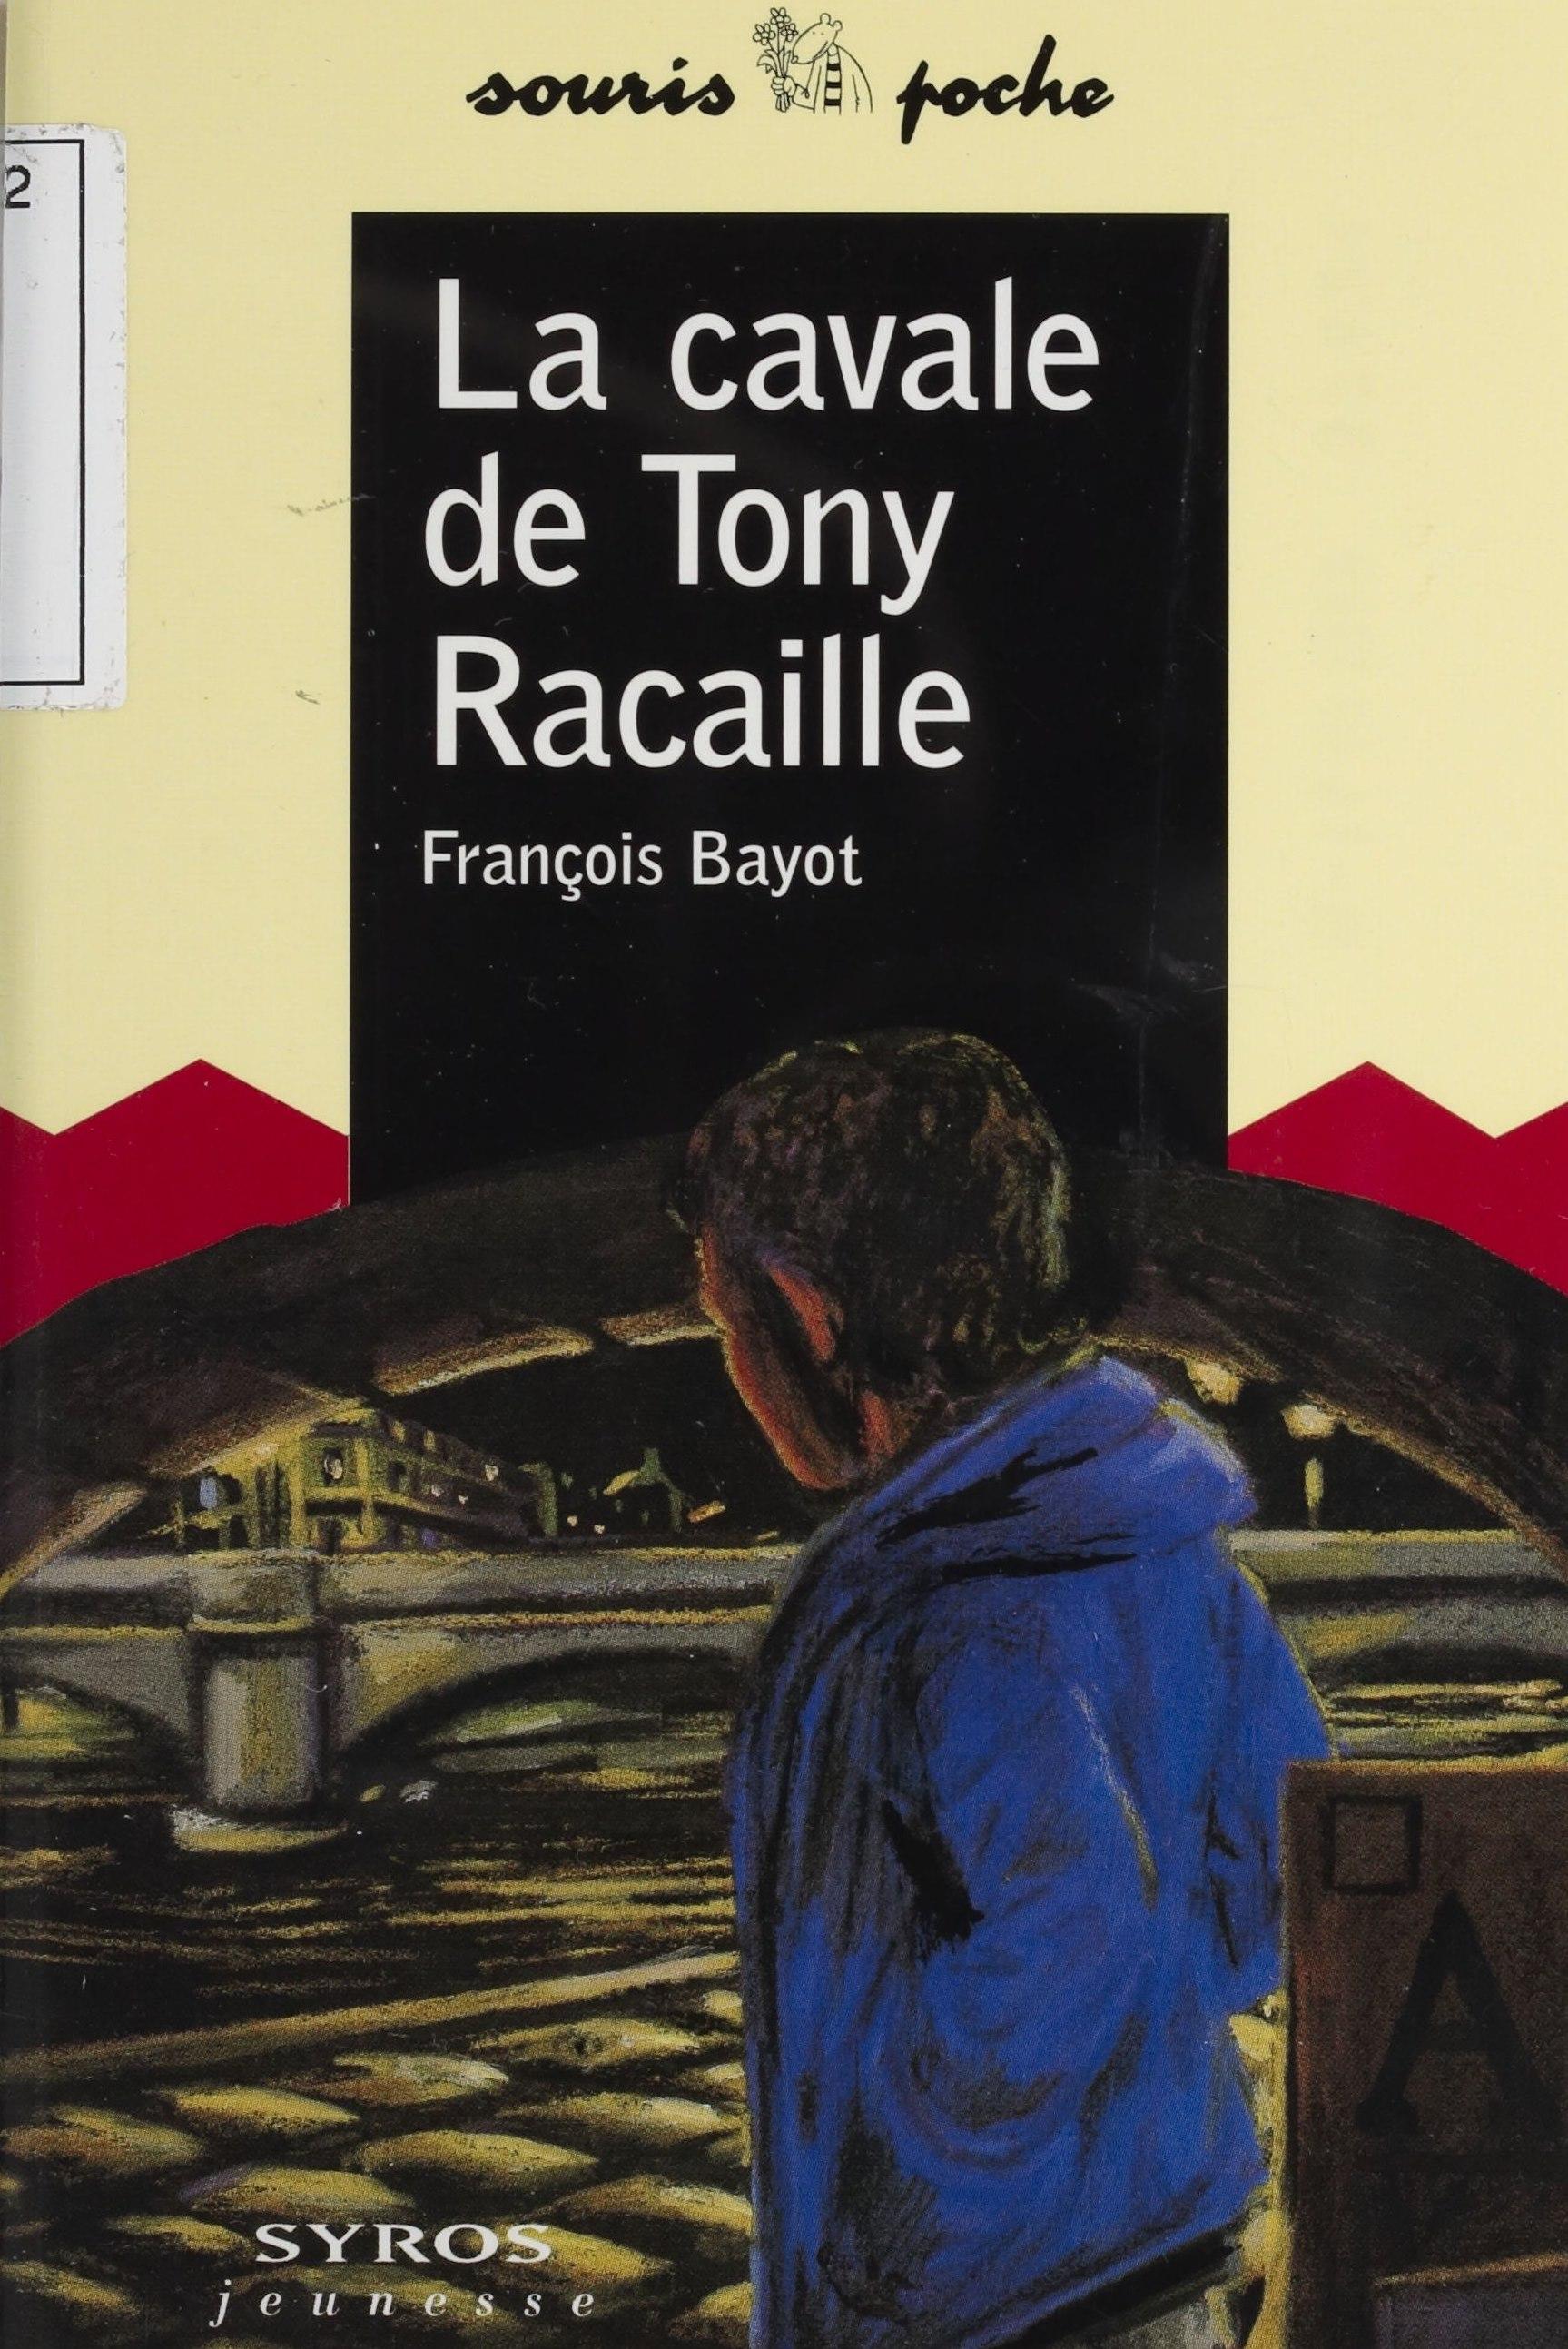 La Cavale de Tony Racaille